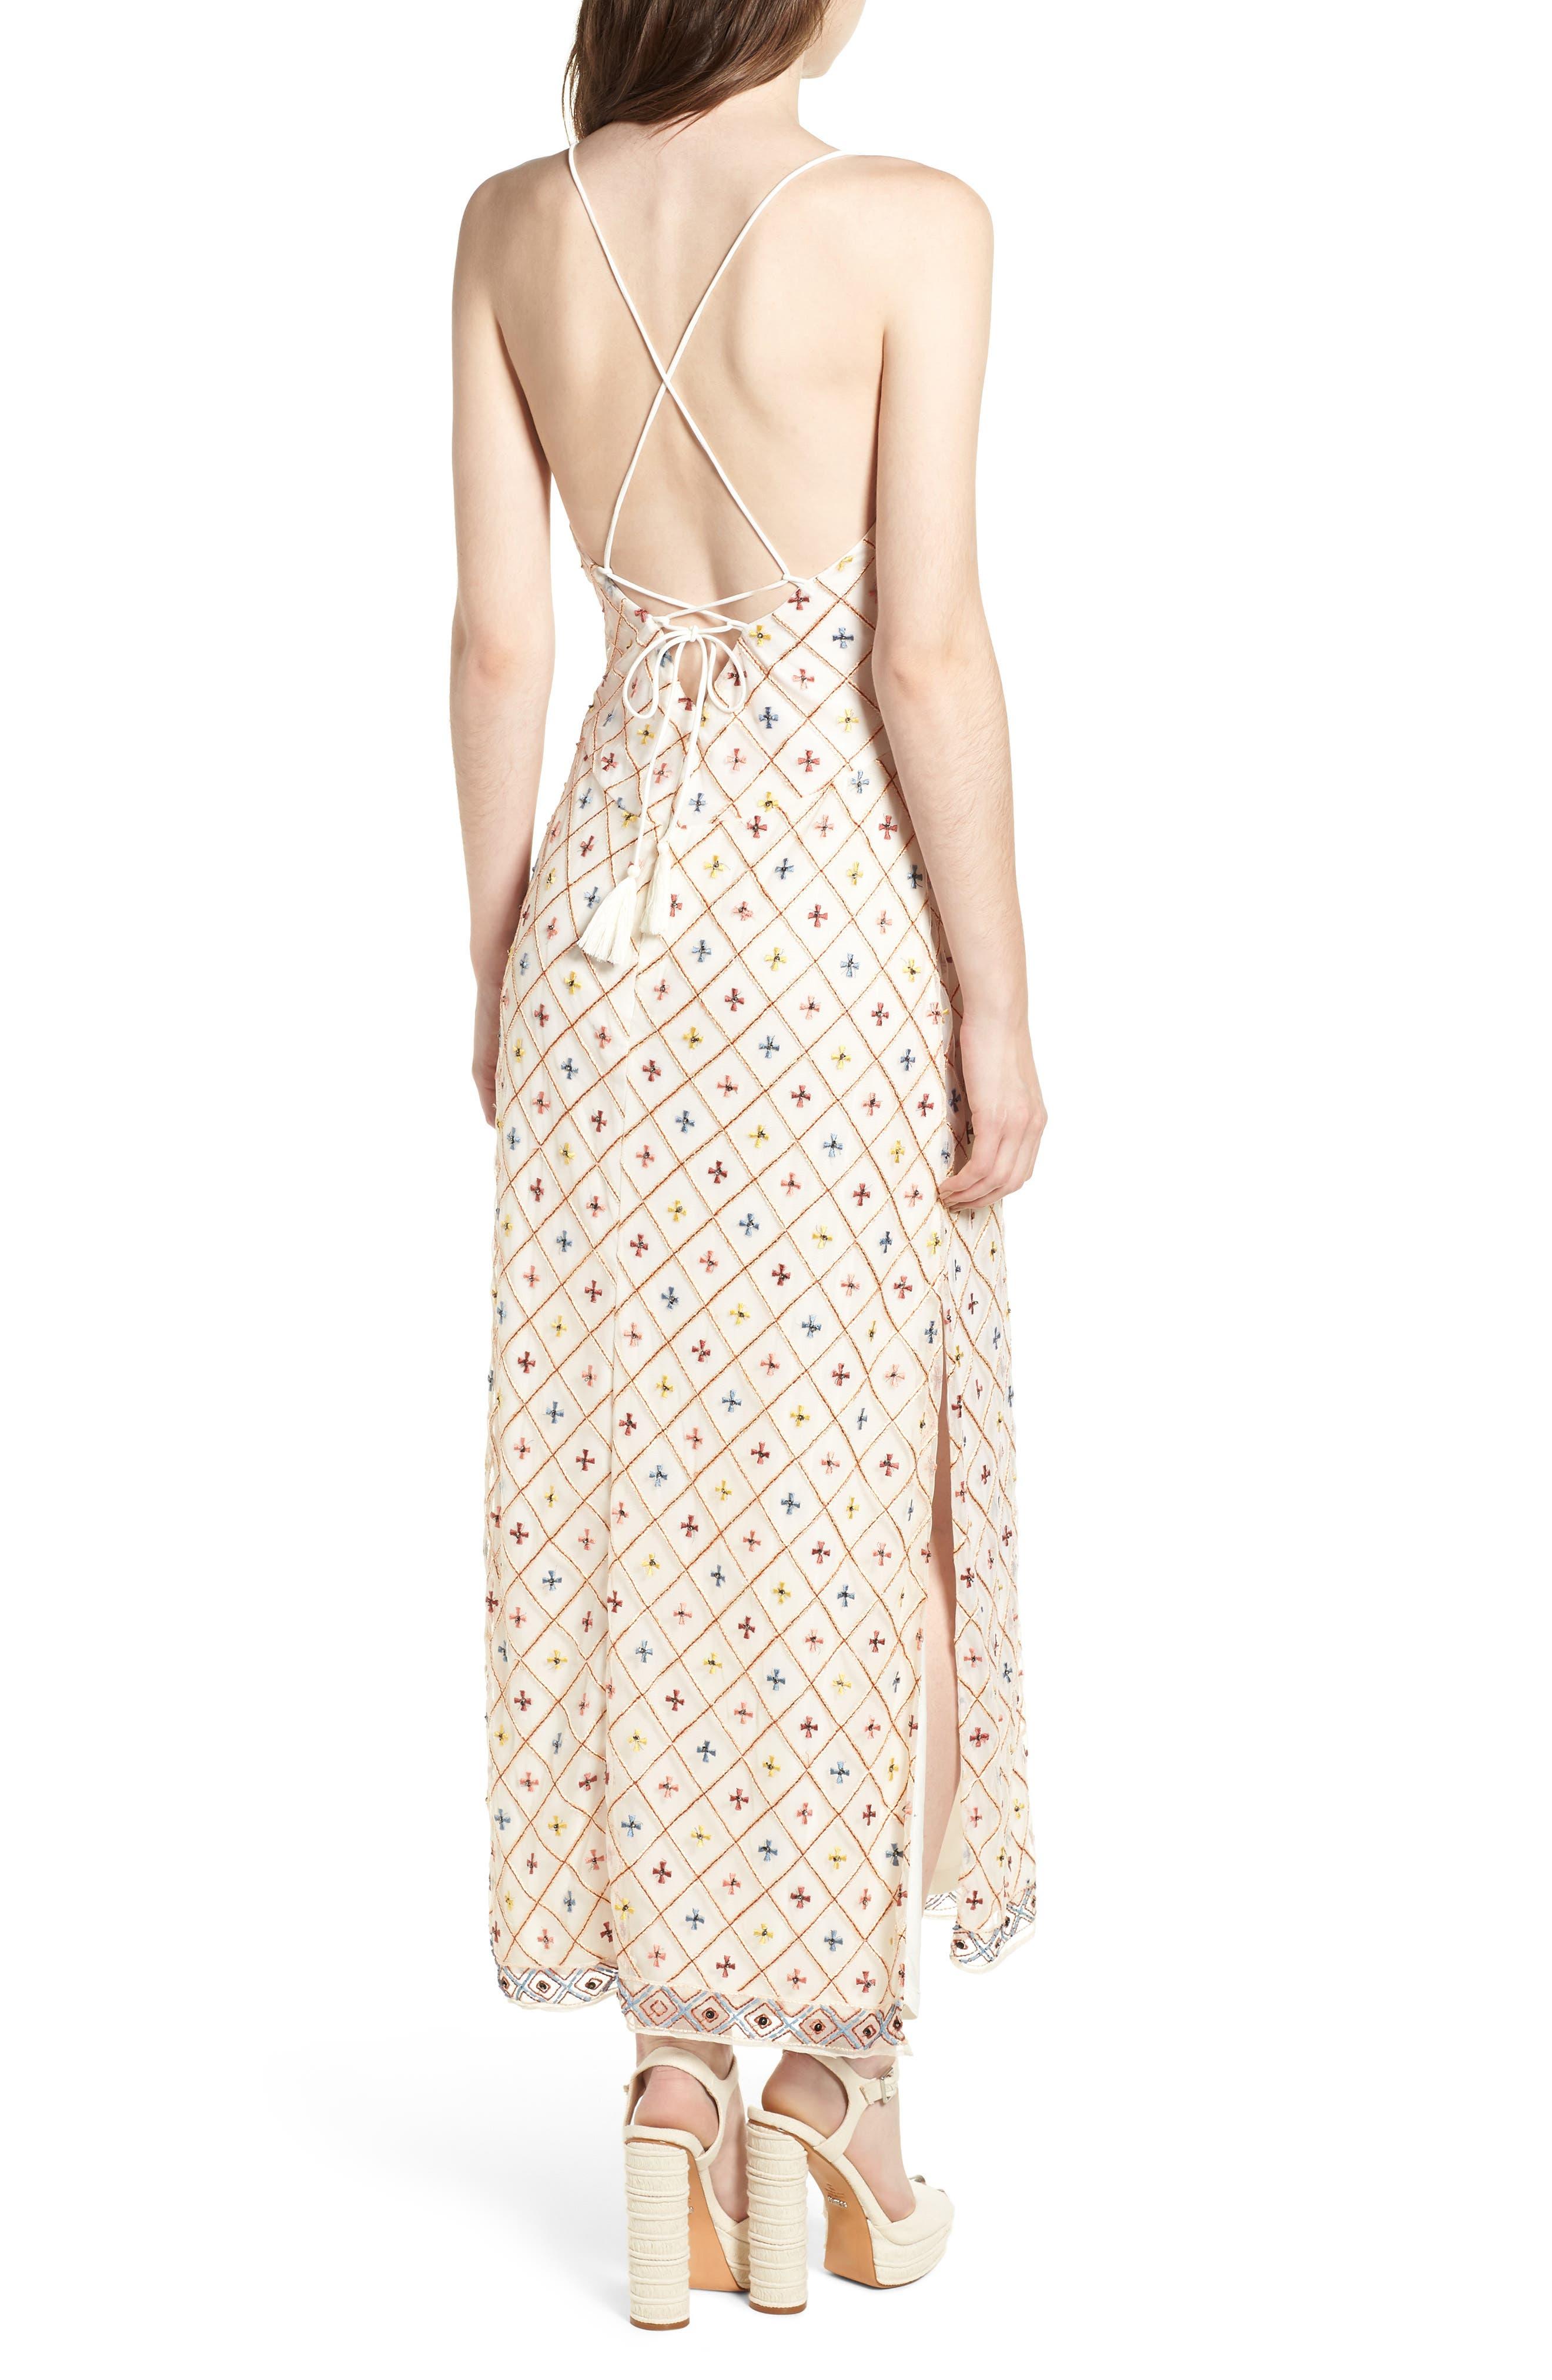 Linda Maxi Dress,                             Alternate thumbnail 2, color,                             Cream